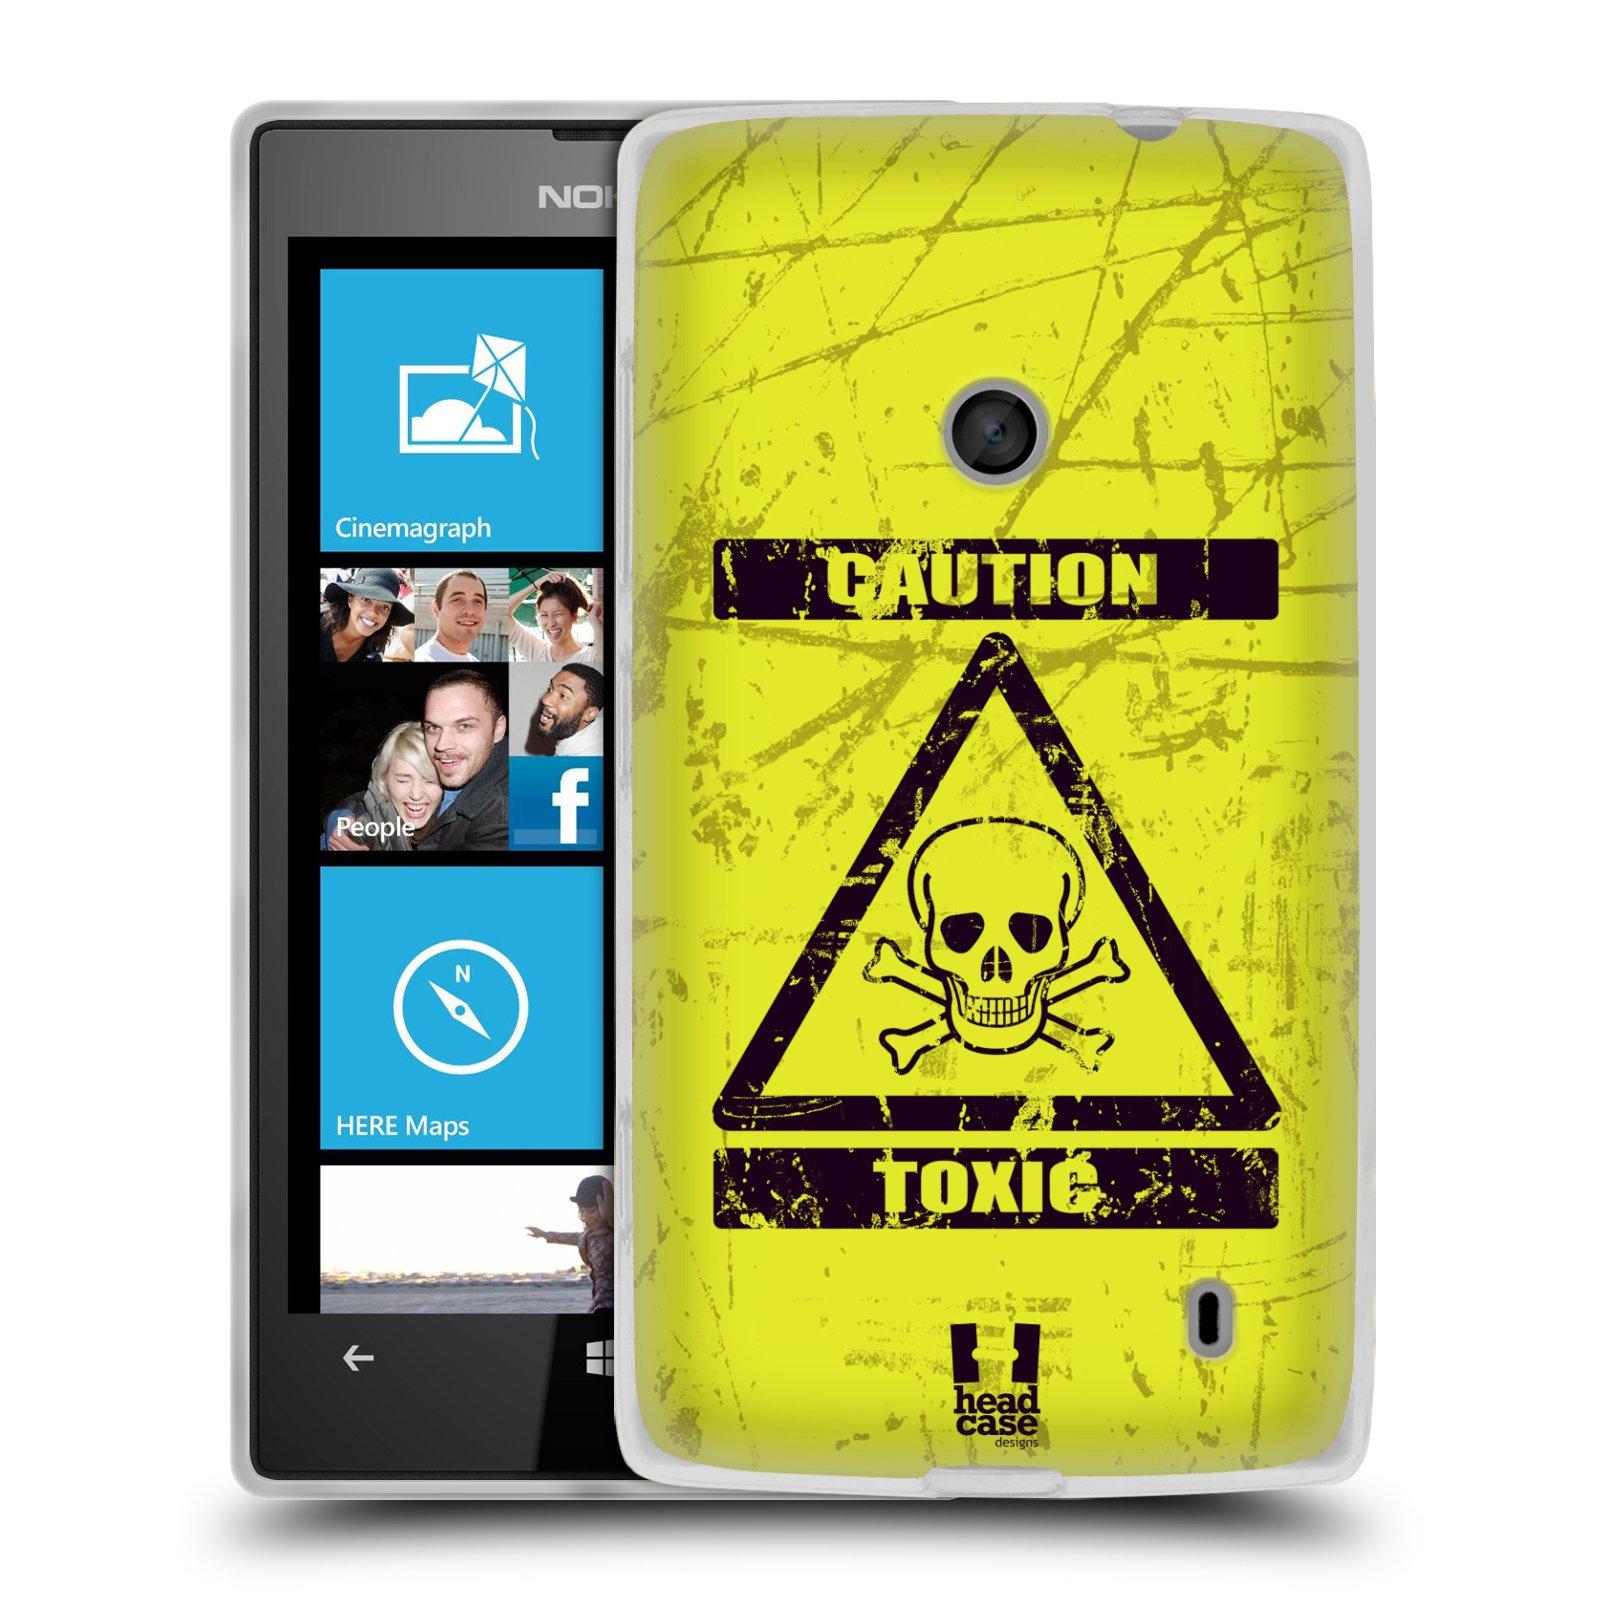 Silikonové pouzdro na mobil Nokia Lumia 520 HEAD CASE TOXIC (Silikonový Kryt či obal na mobilní telefon Nokia Lumia 520)